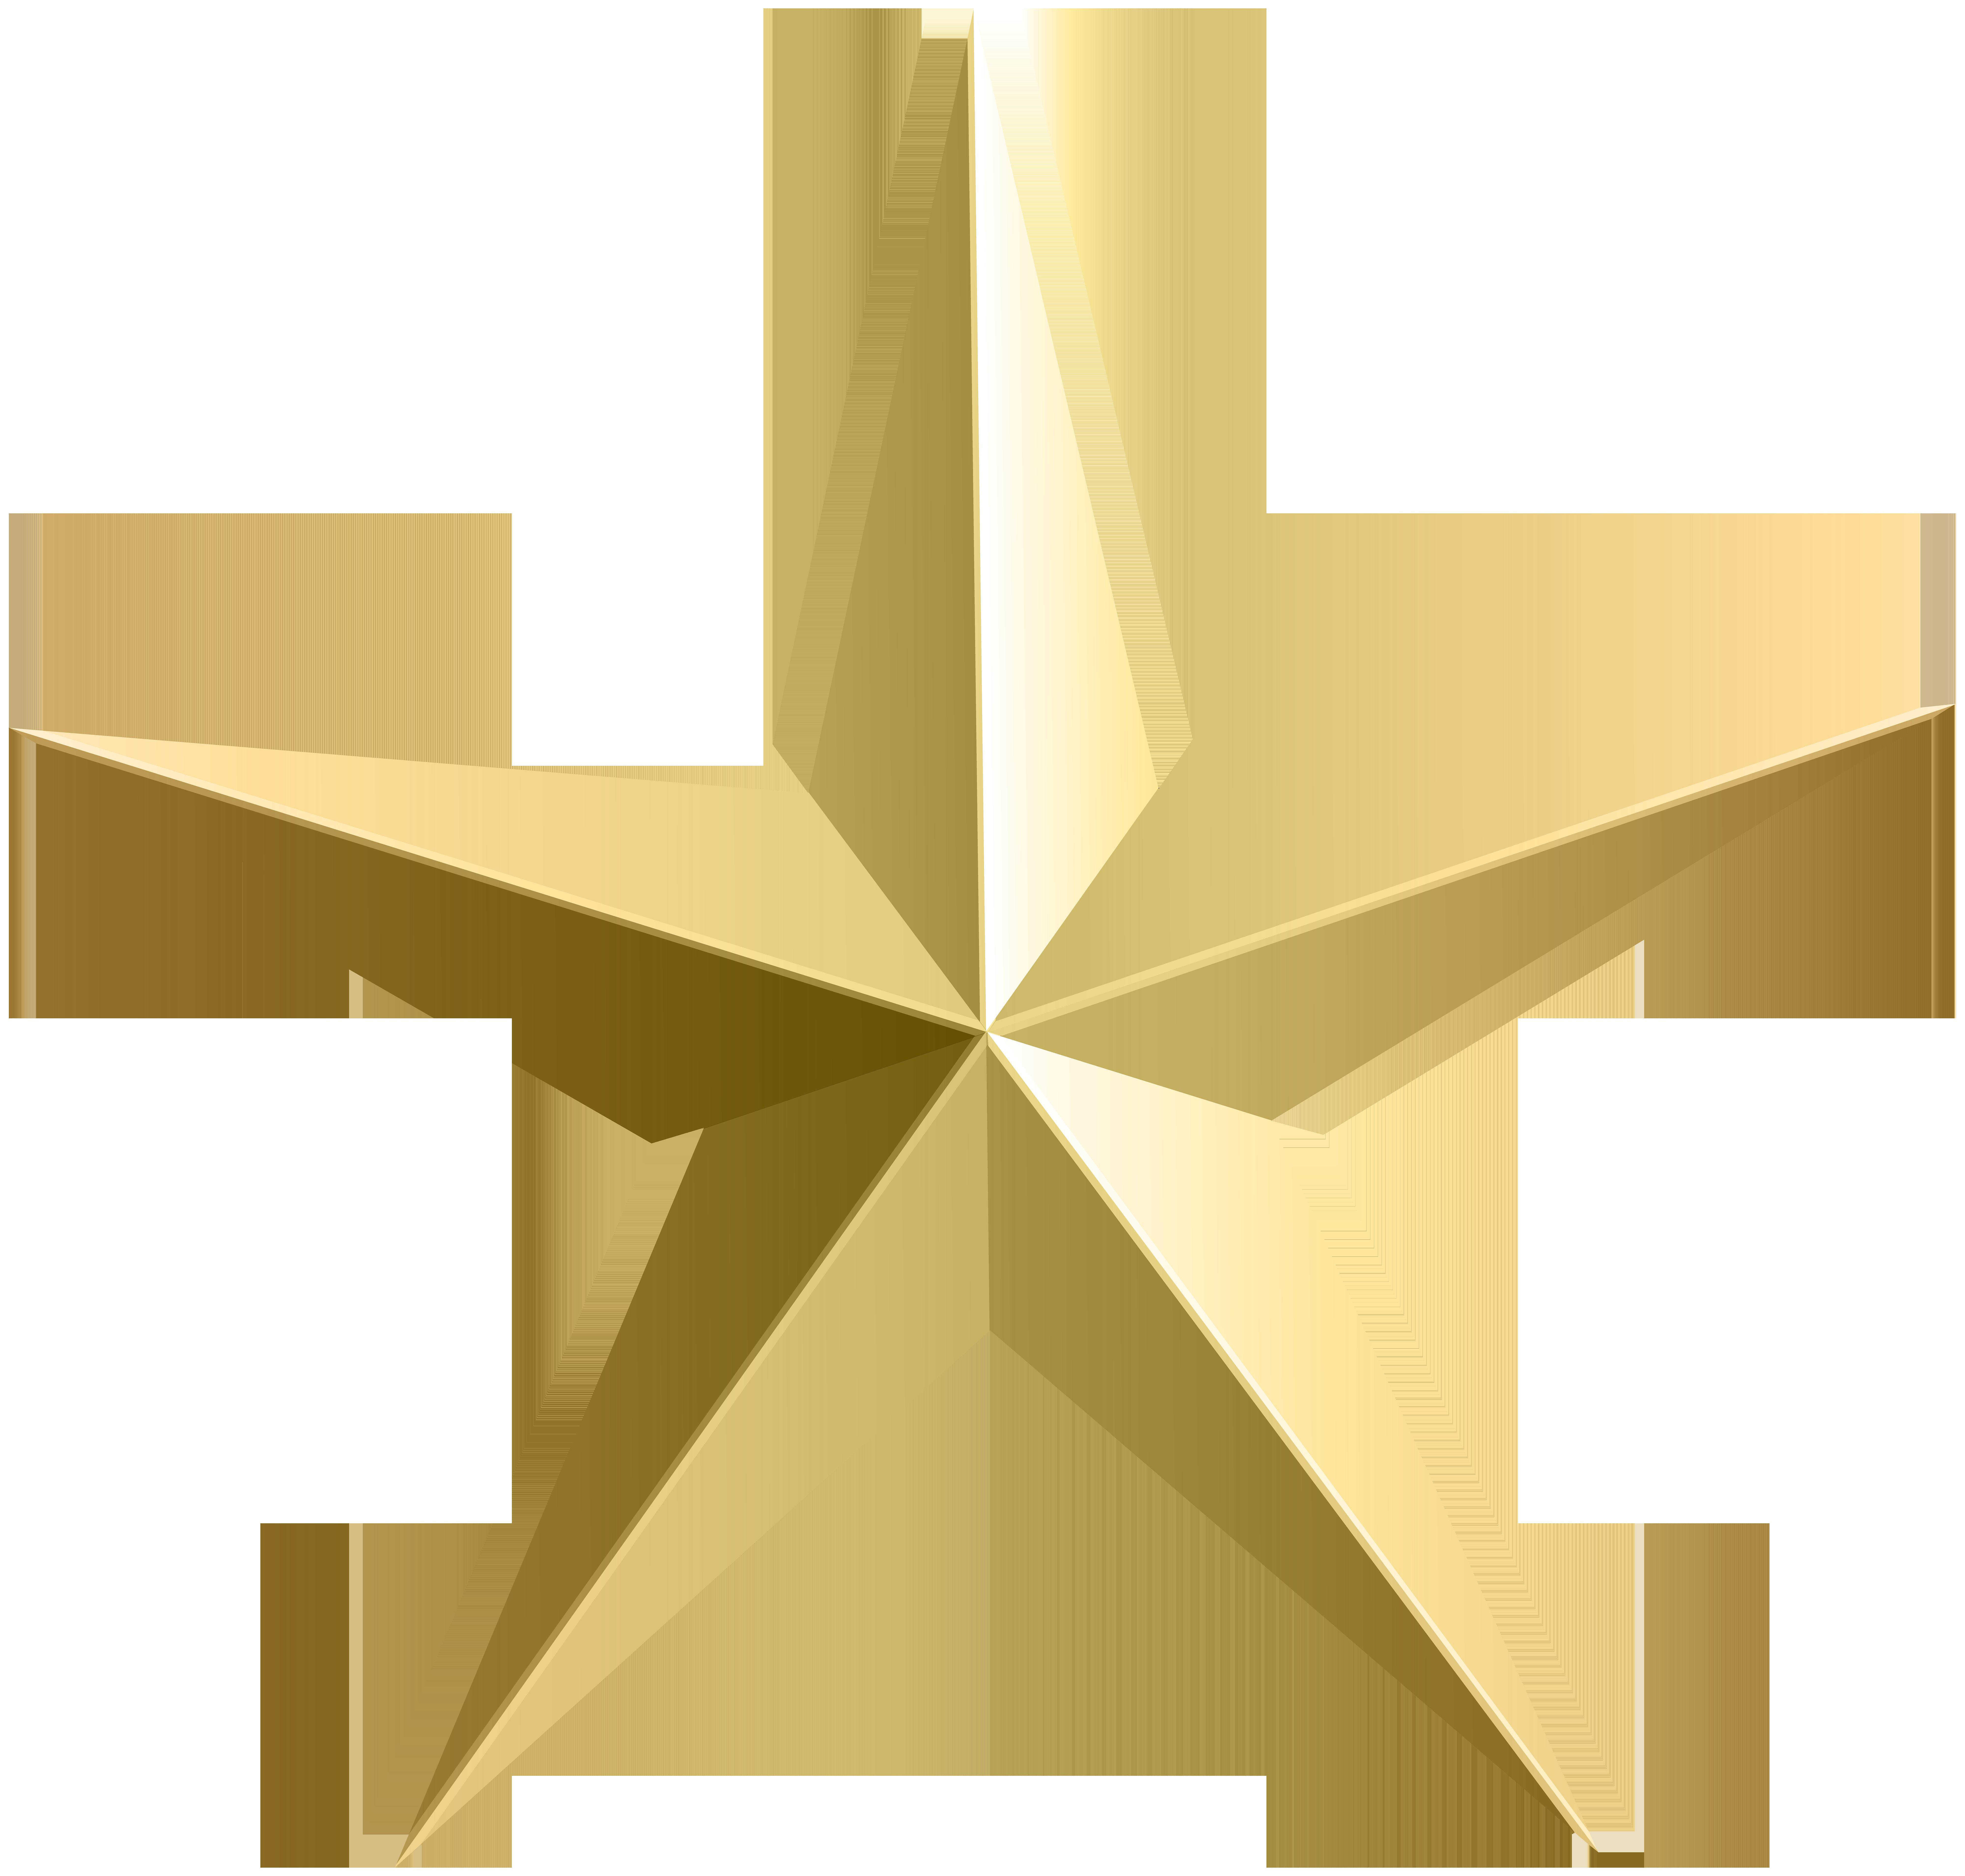 Silver Star Clip art.